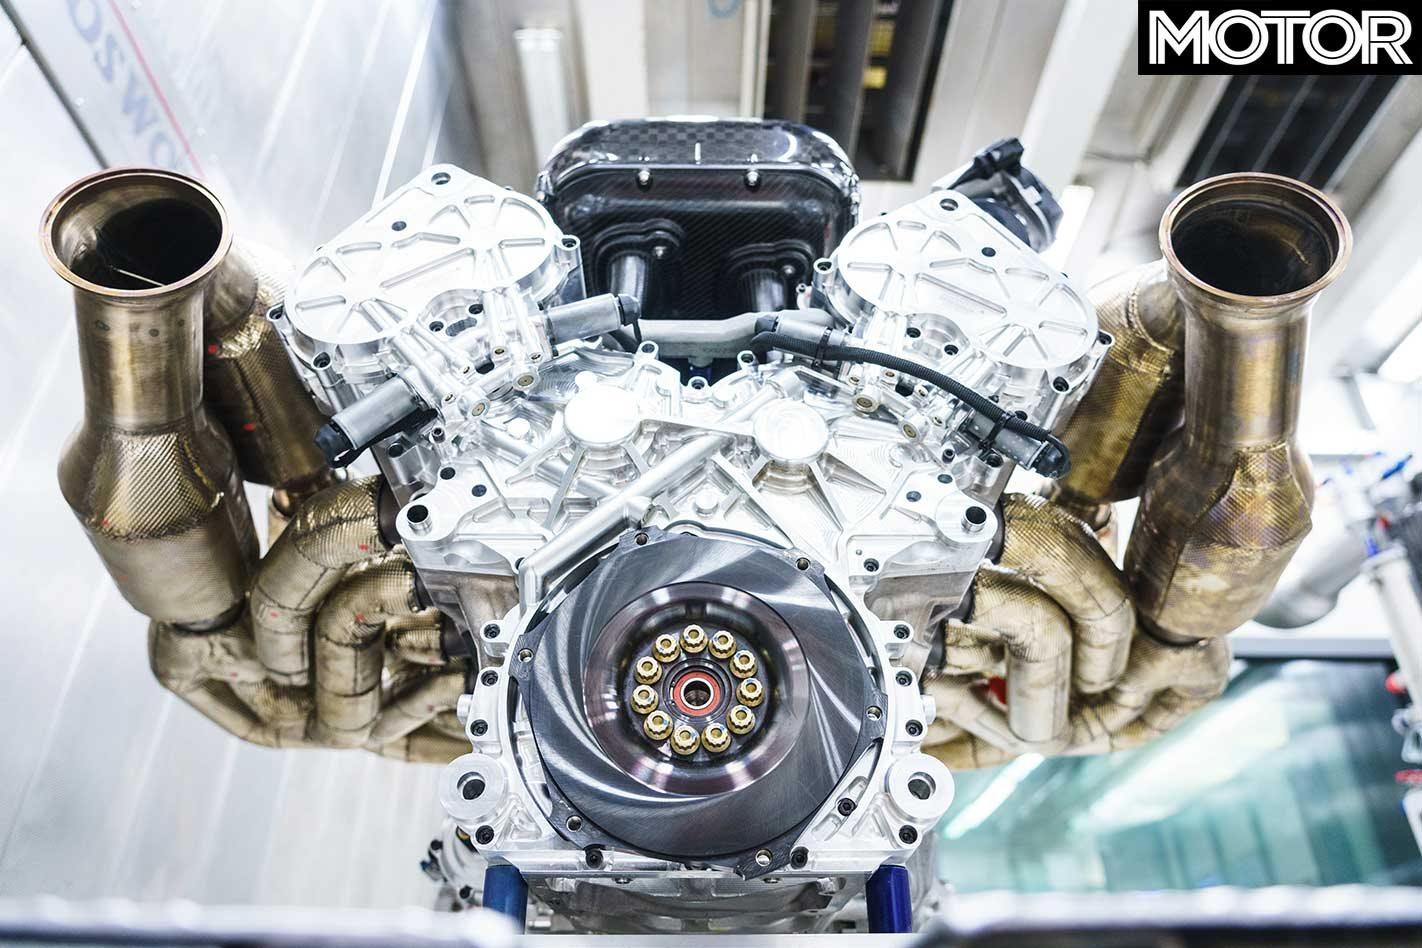 Aston Martin Valkyrie's V12 engine is 'a masterpiece'